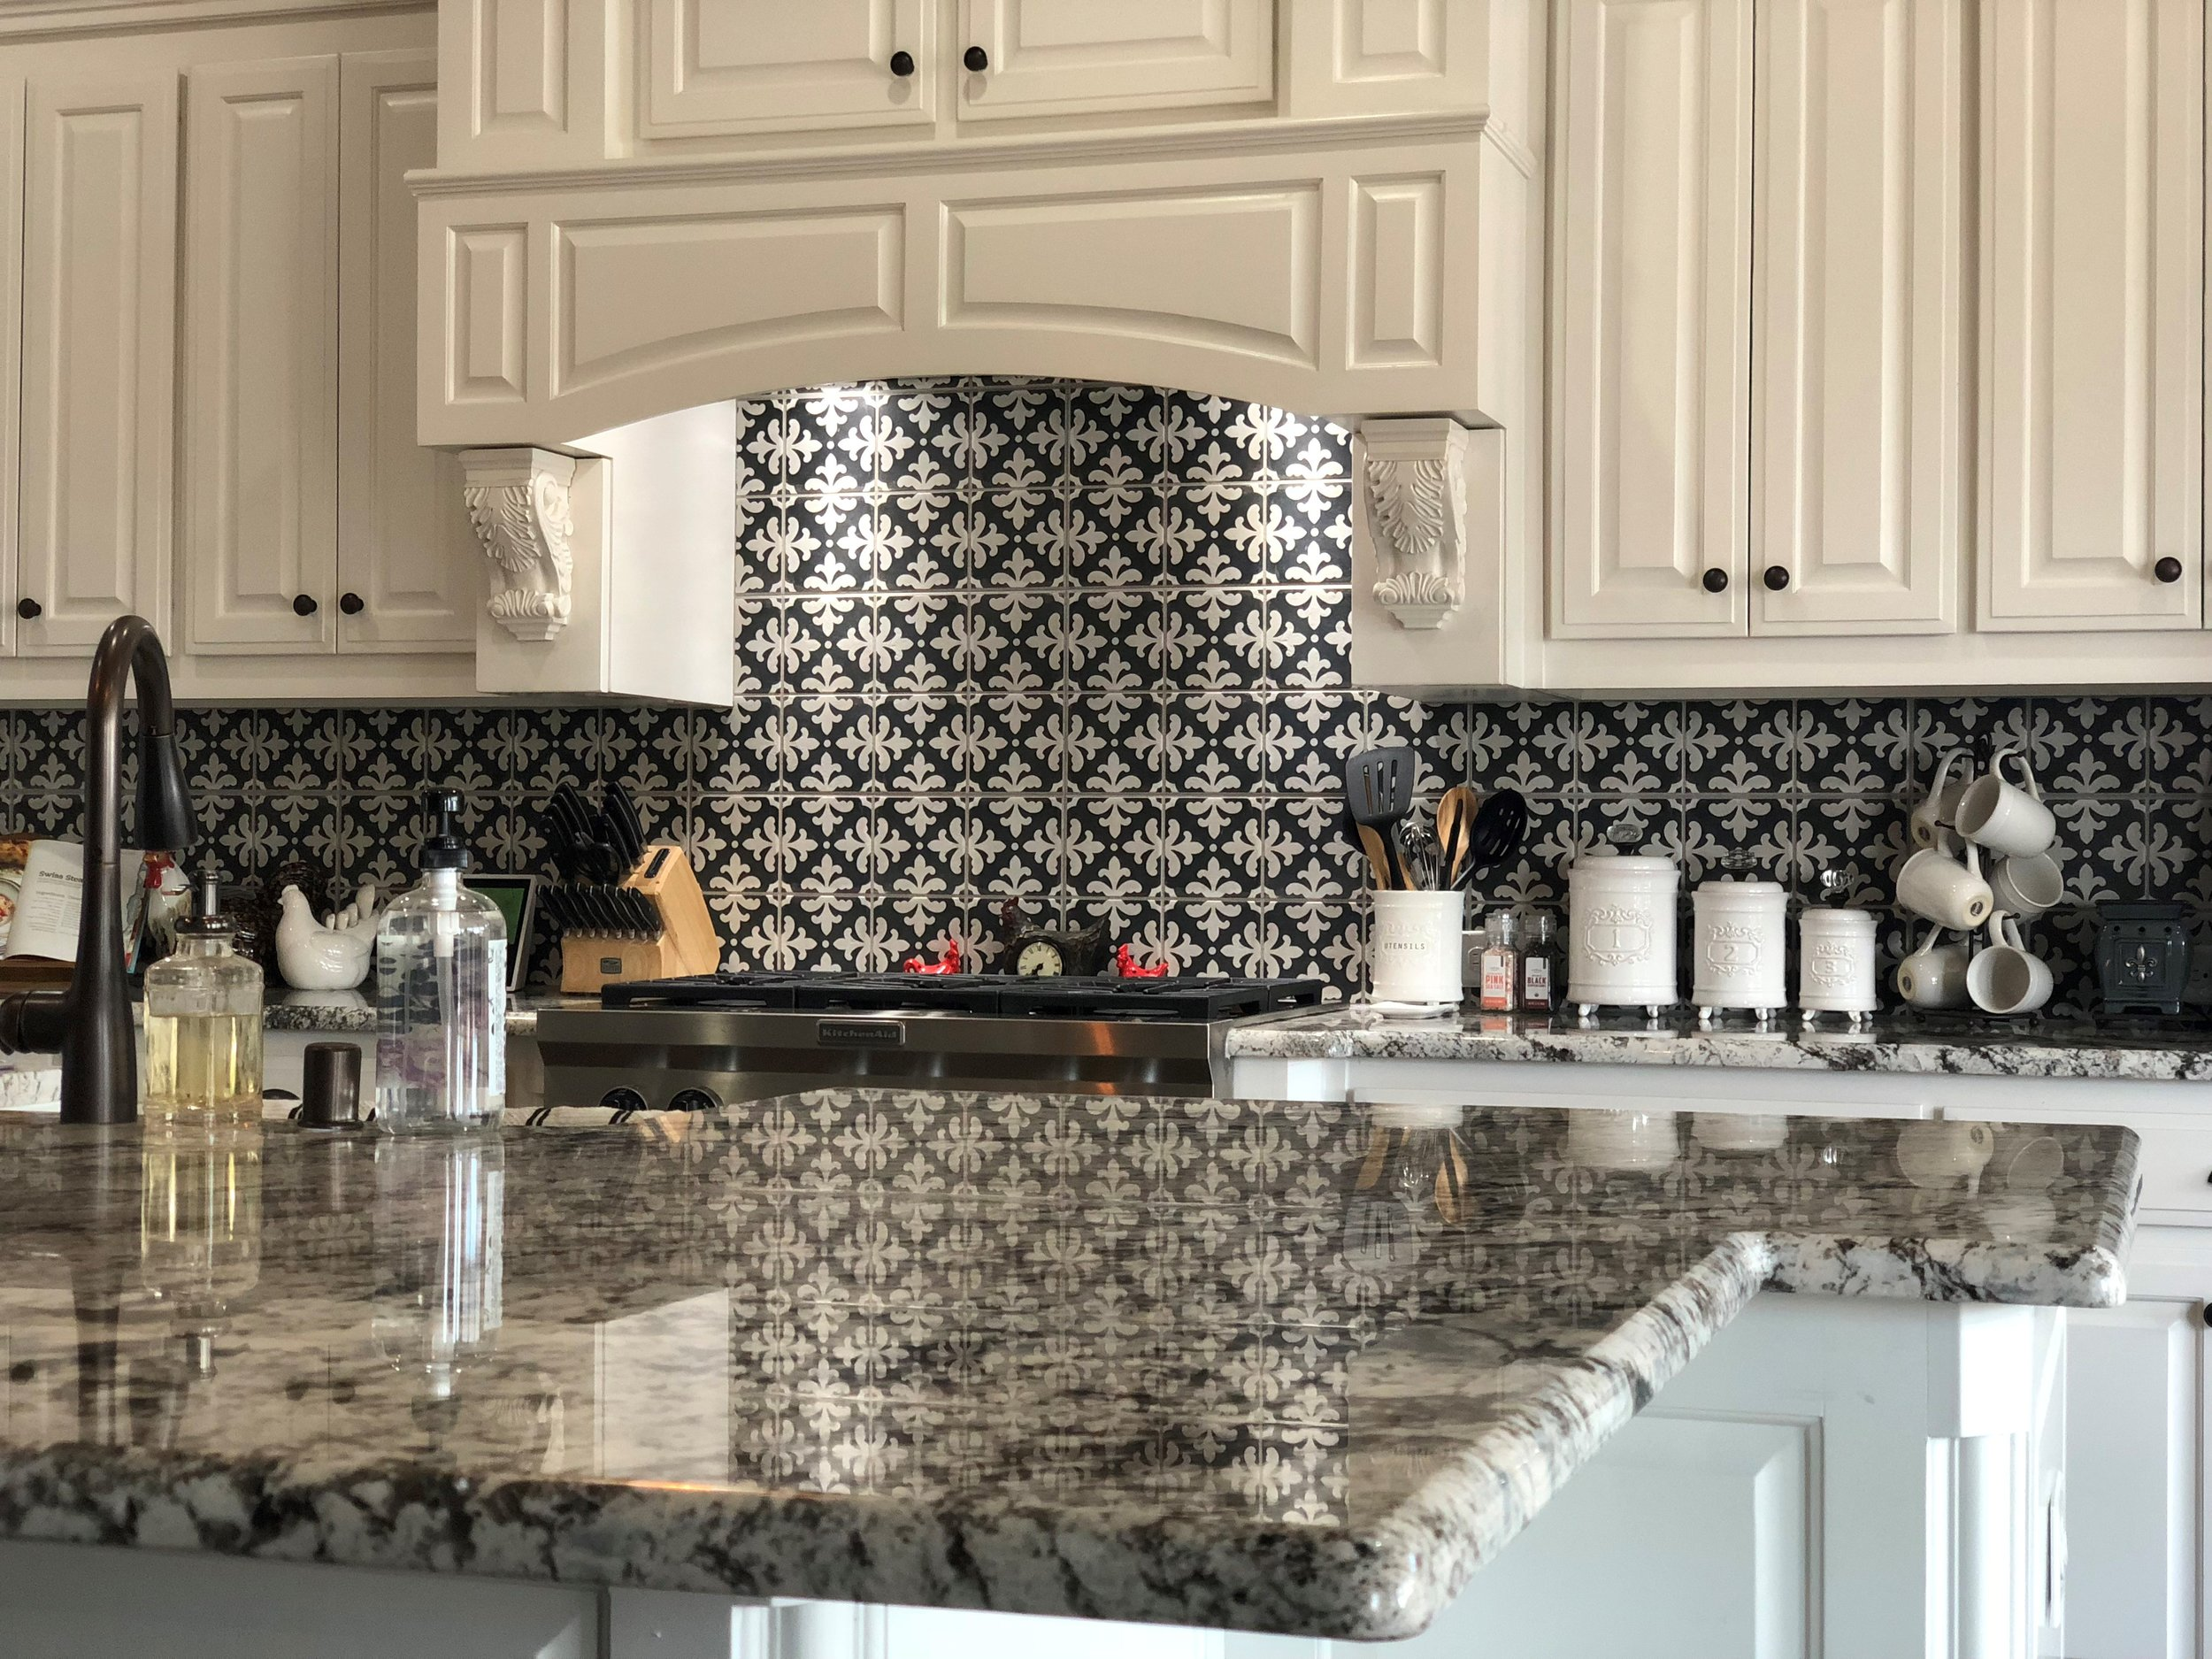 Kitchen Countertop & Backsplash.jpg